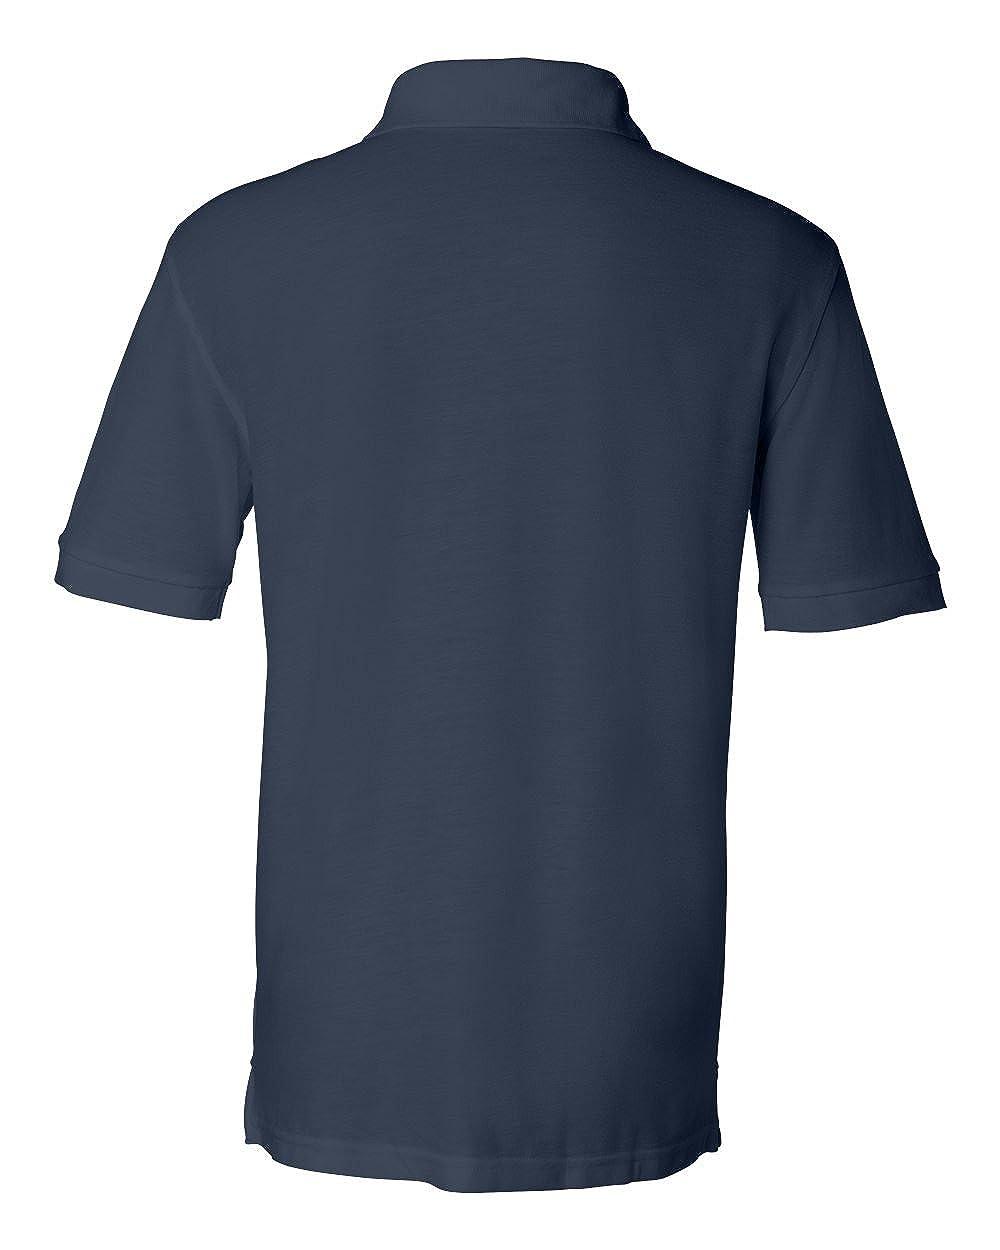 FeatherLite Mens Pique Sport Shirt 0500